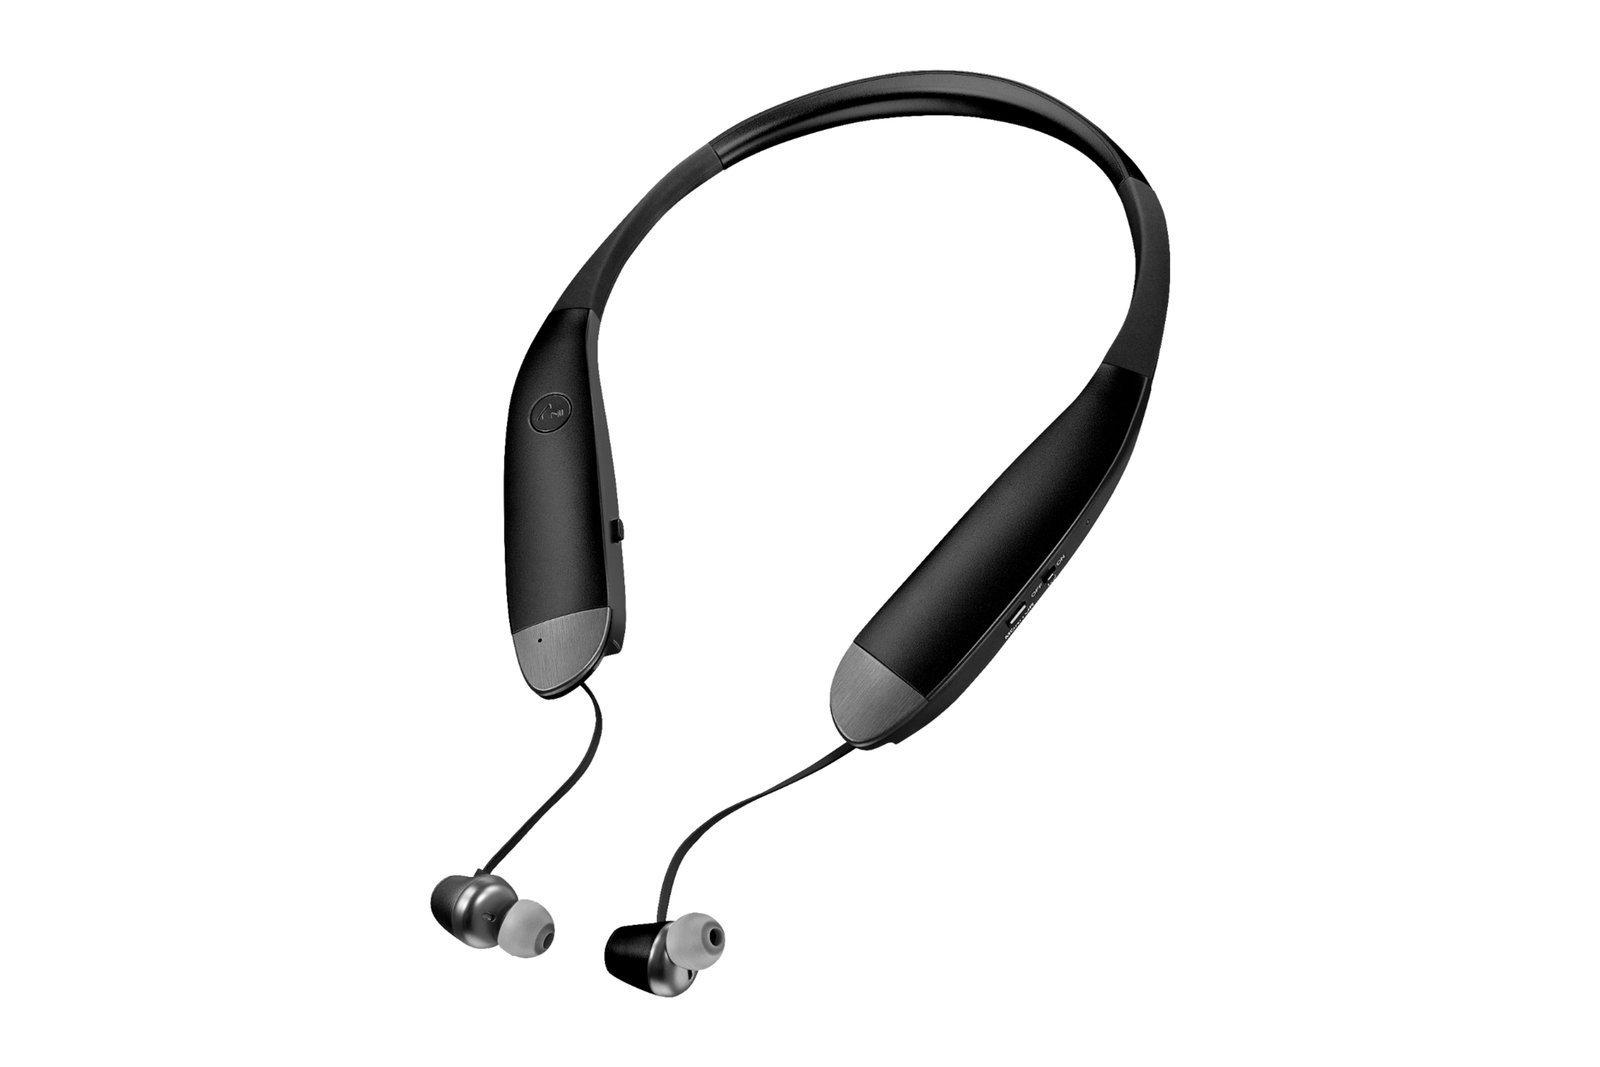 Insignia Wireless Noise Cancelling In-Ear Headphones Black